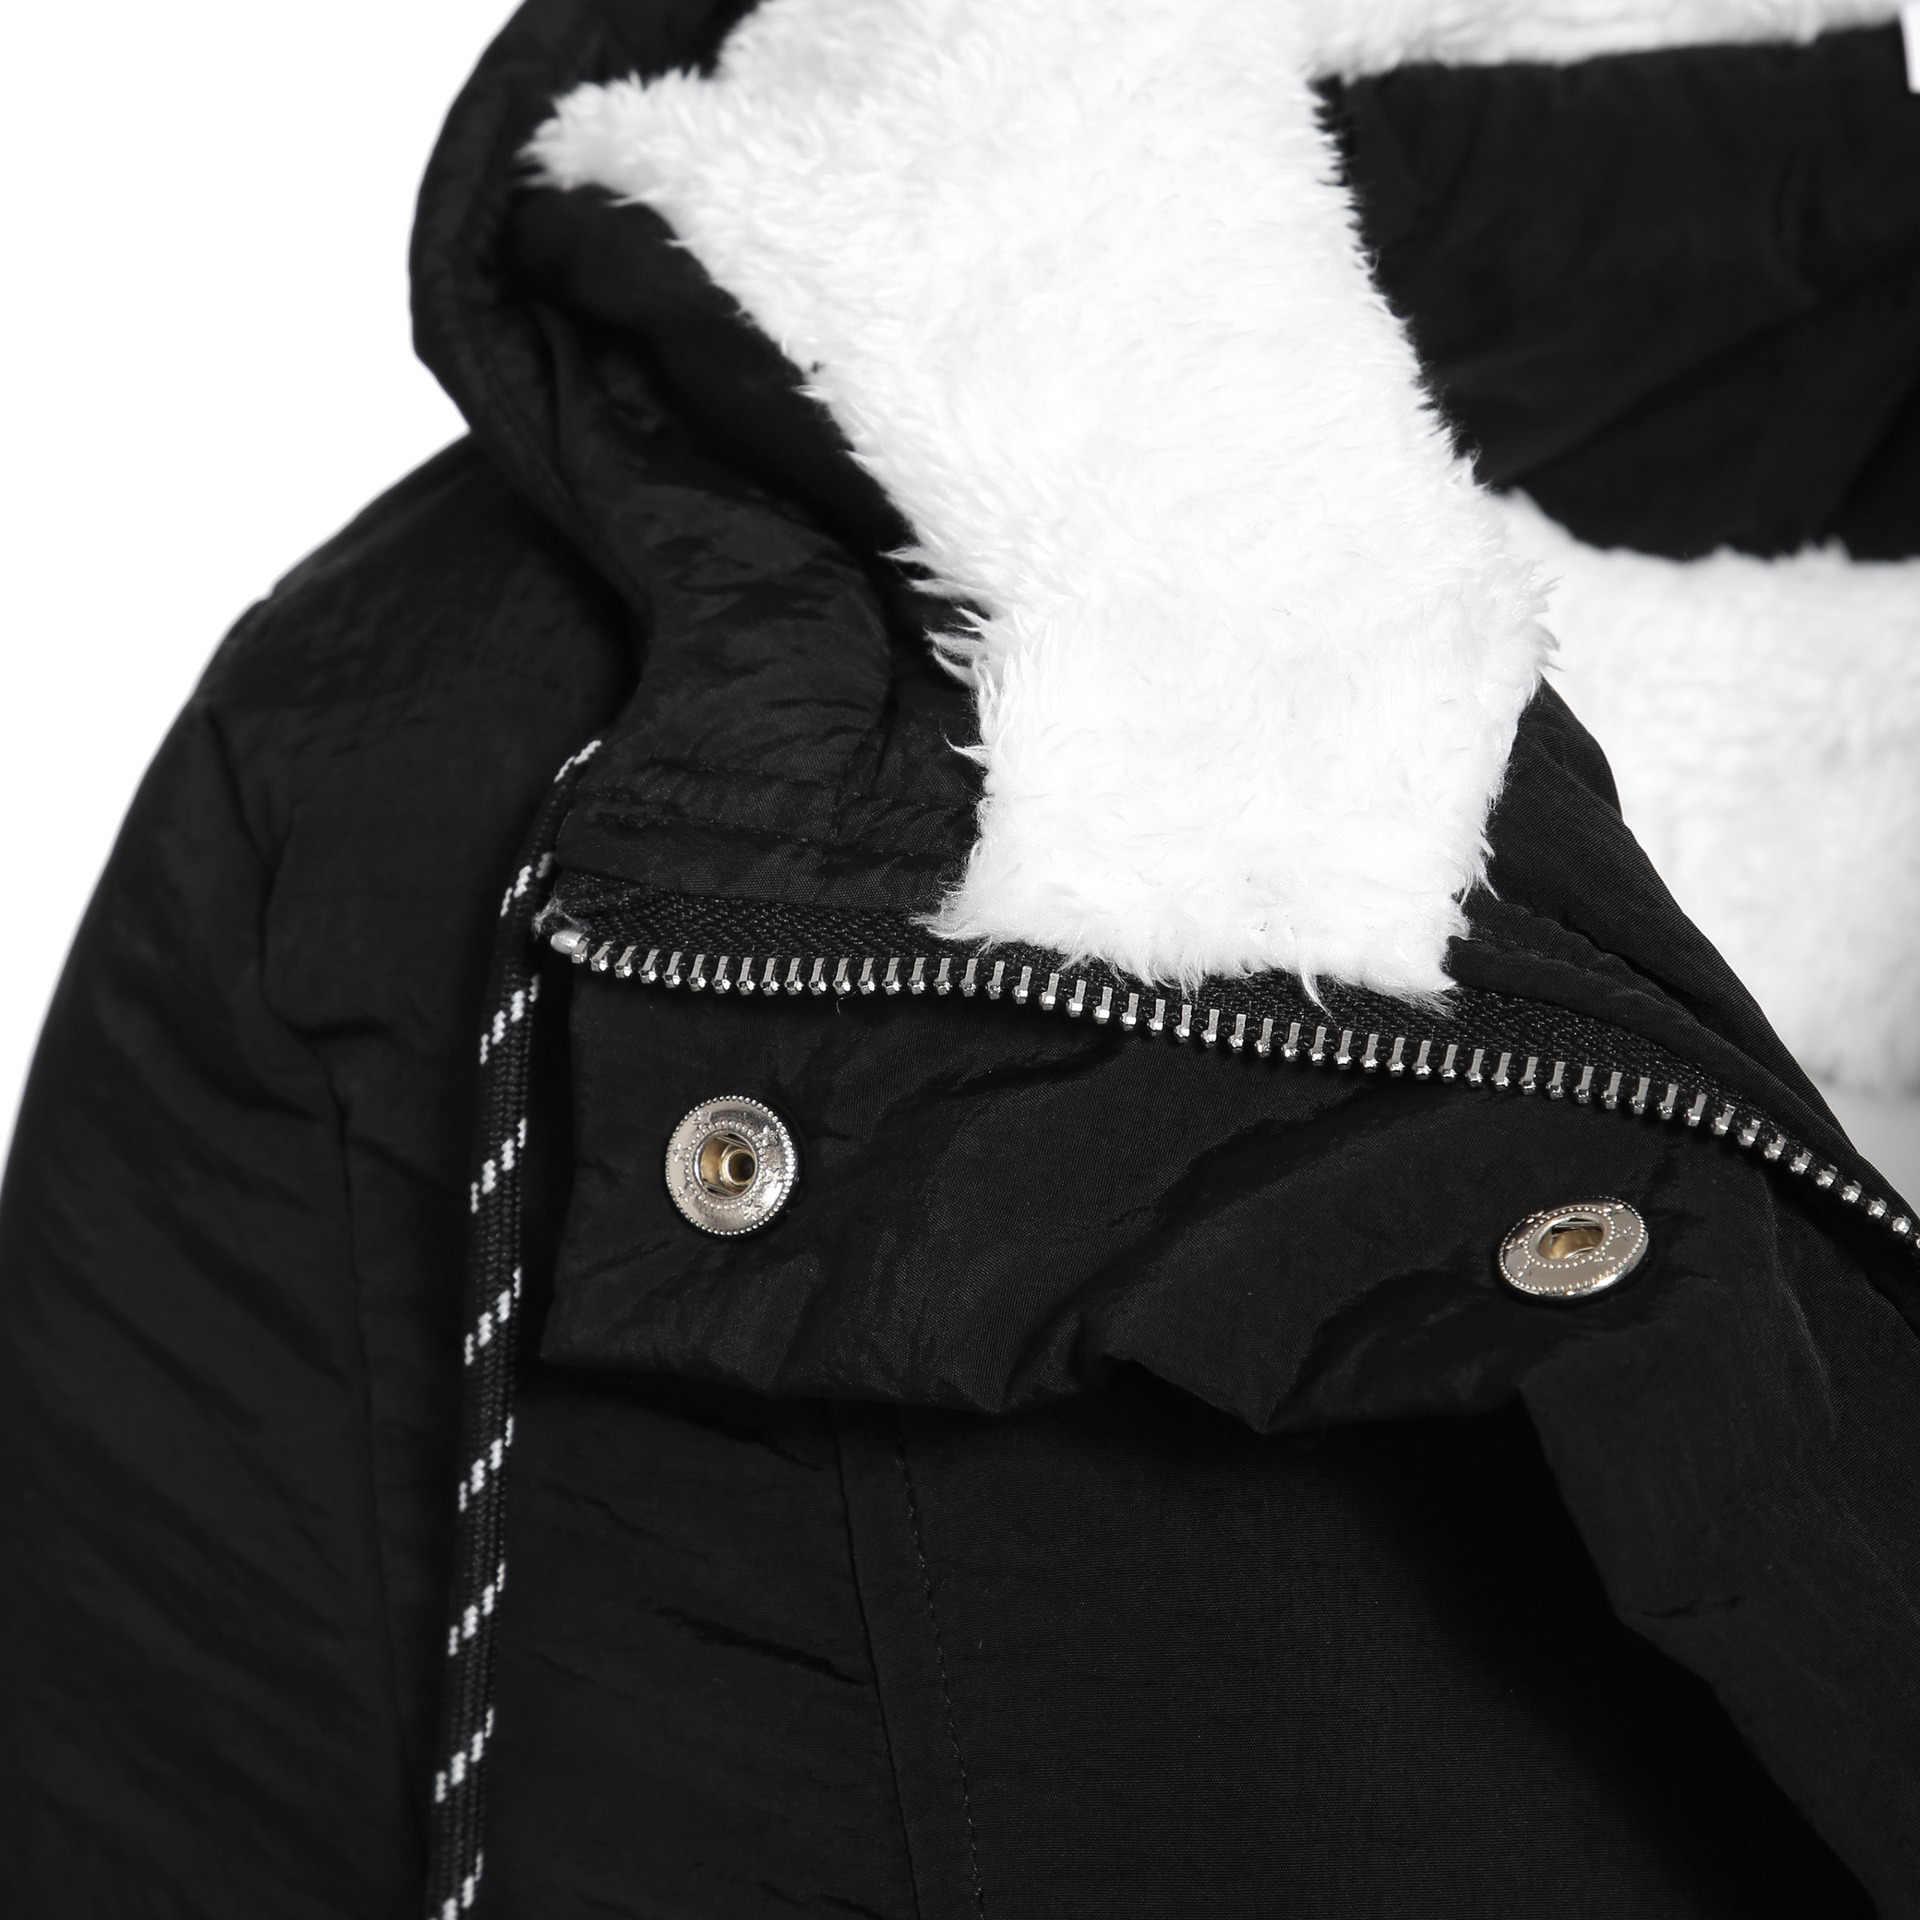 Liva ガール女性パーカー冬コートのフード付き厚い綿暖かい女性のジャケットファッションミッドロングキルトコート生き抜くプラスサイズ 5XL